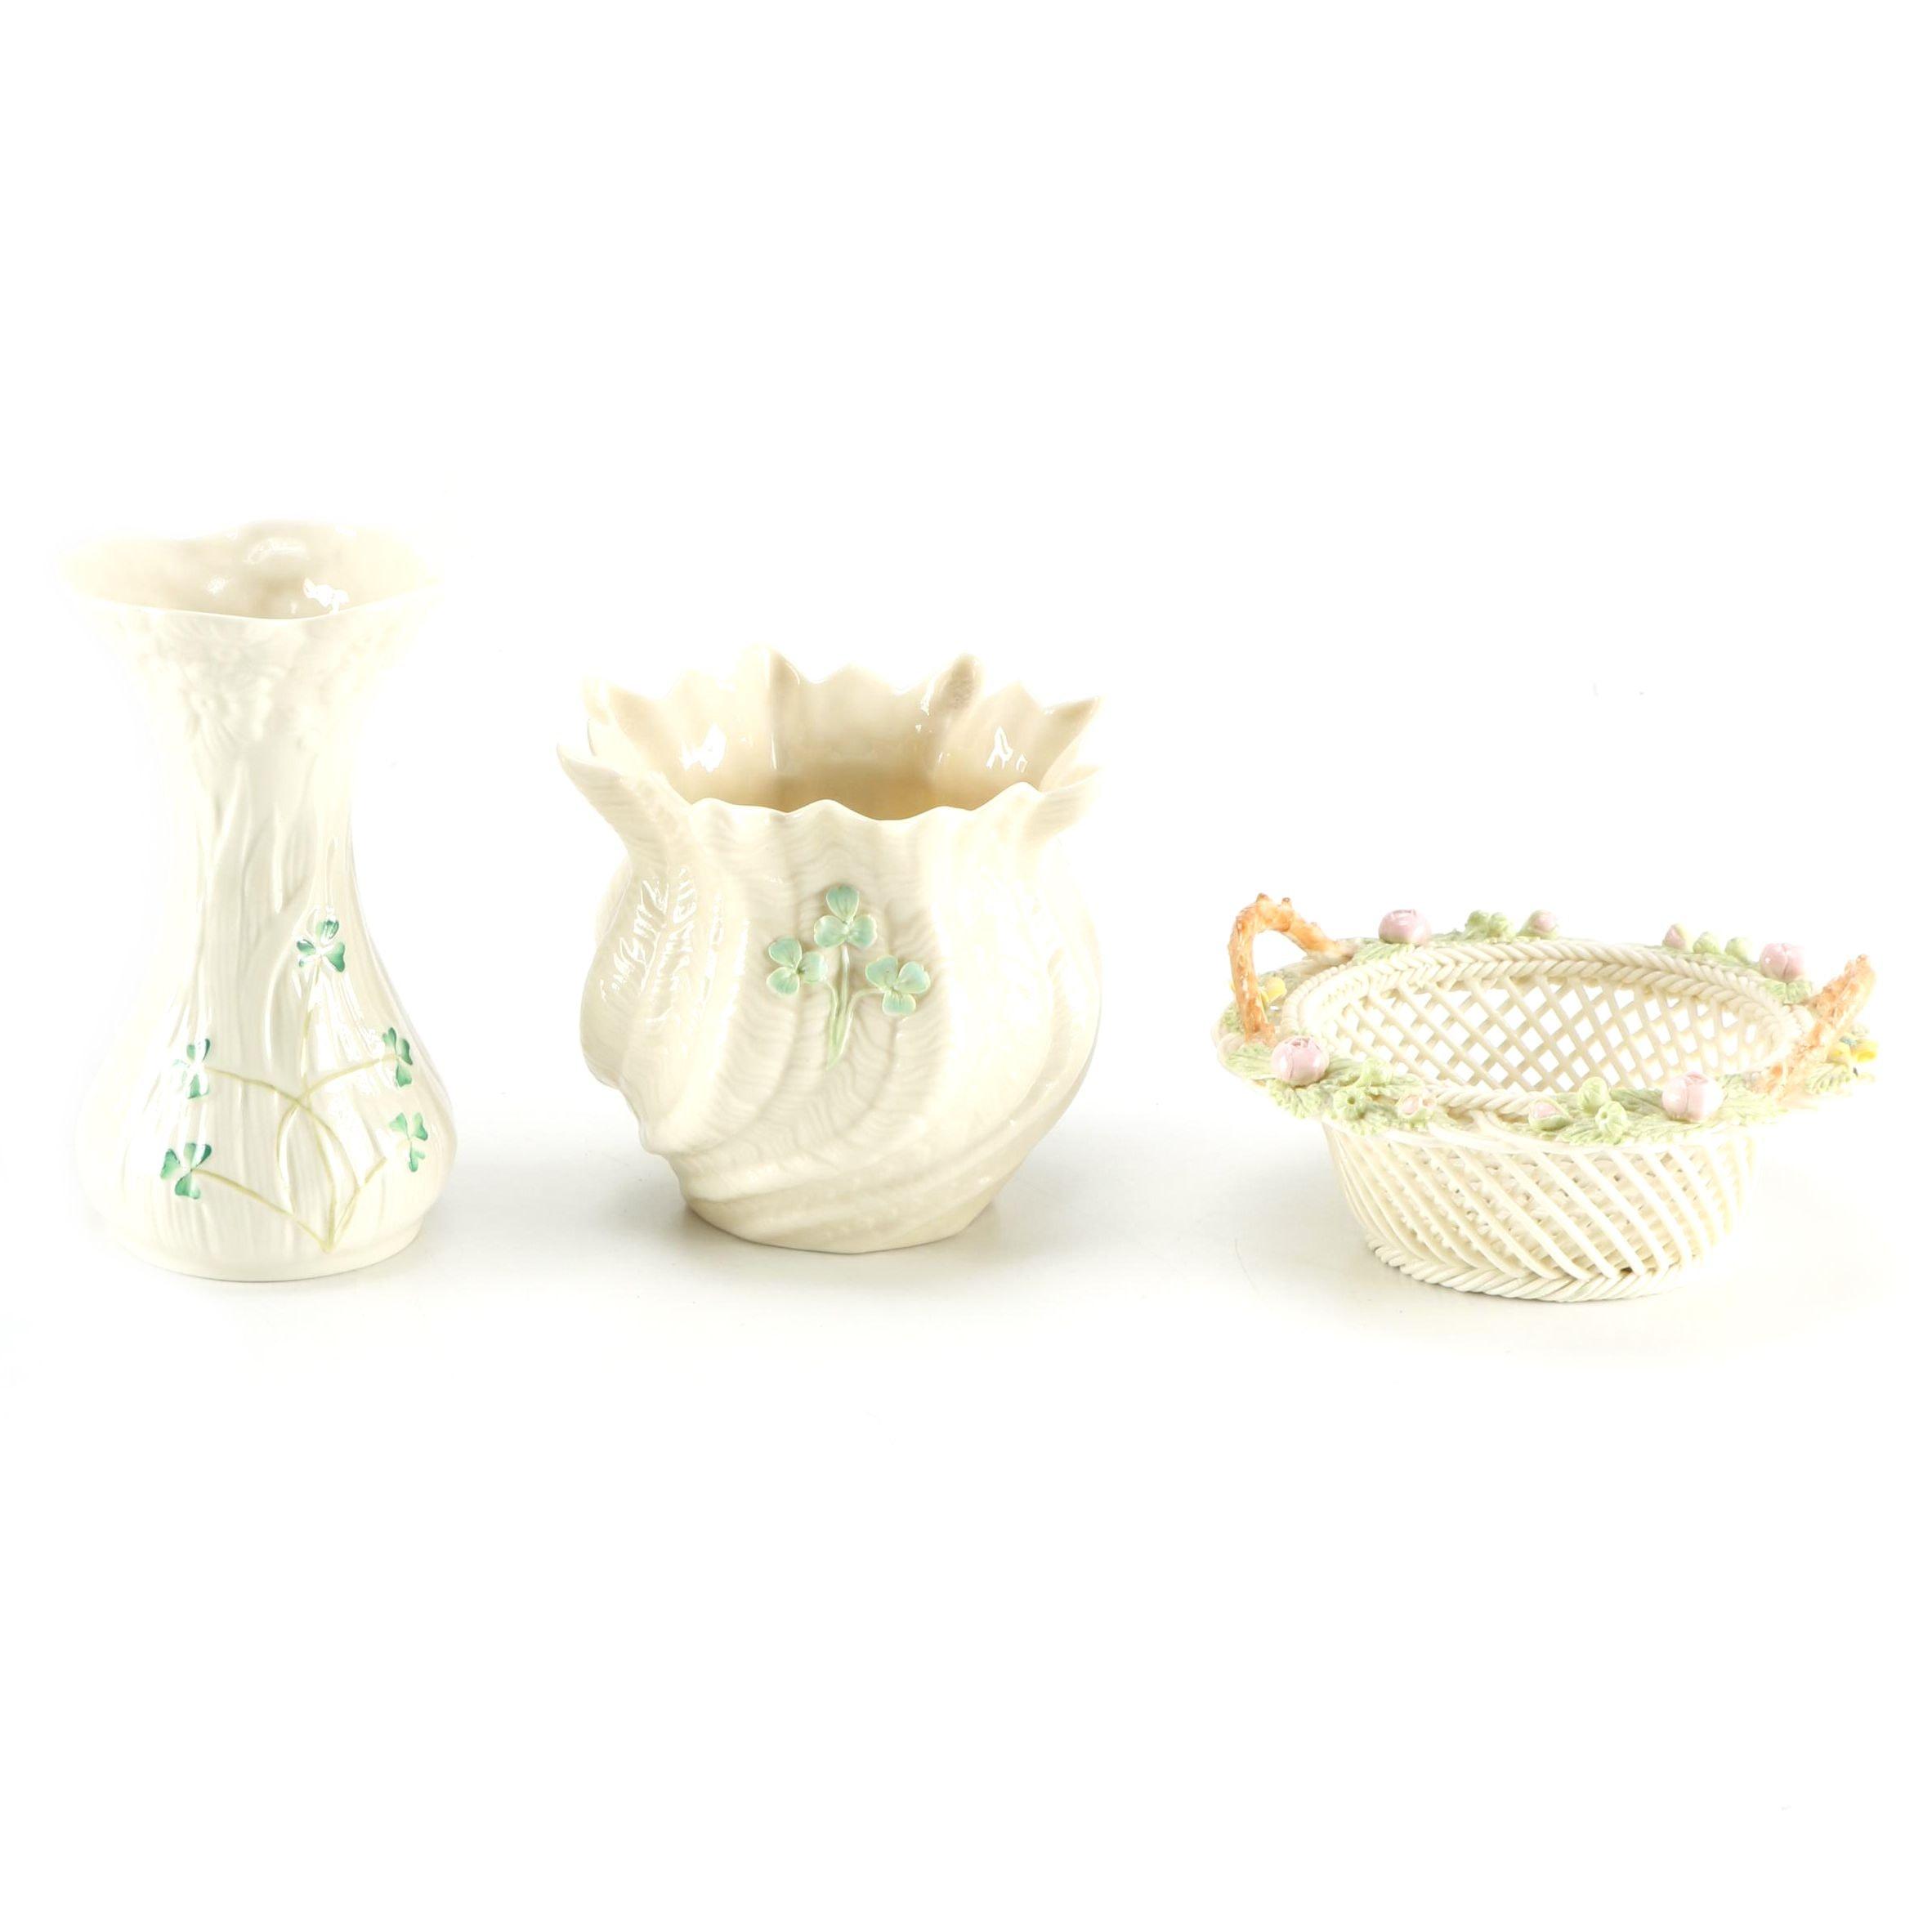 Porcelain Vessels Featuring Belleek